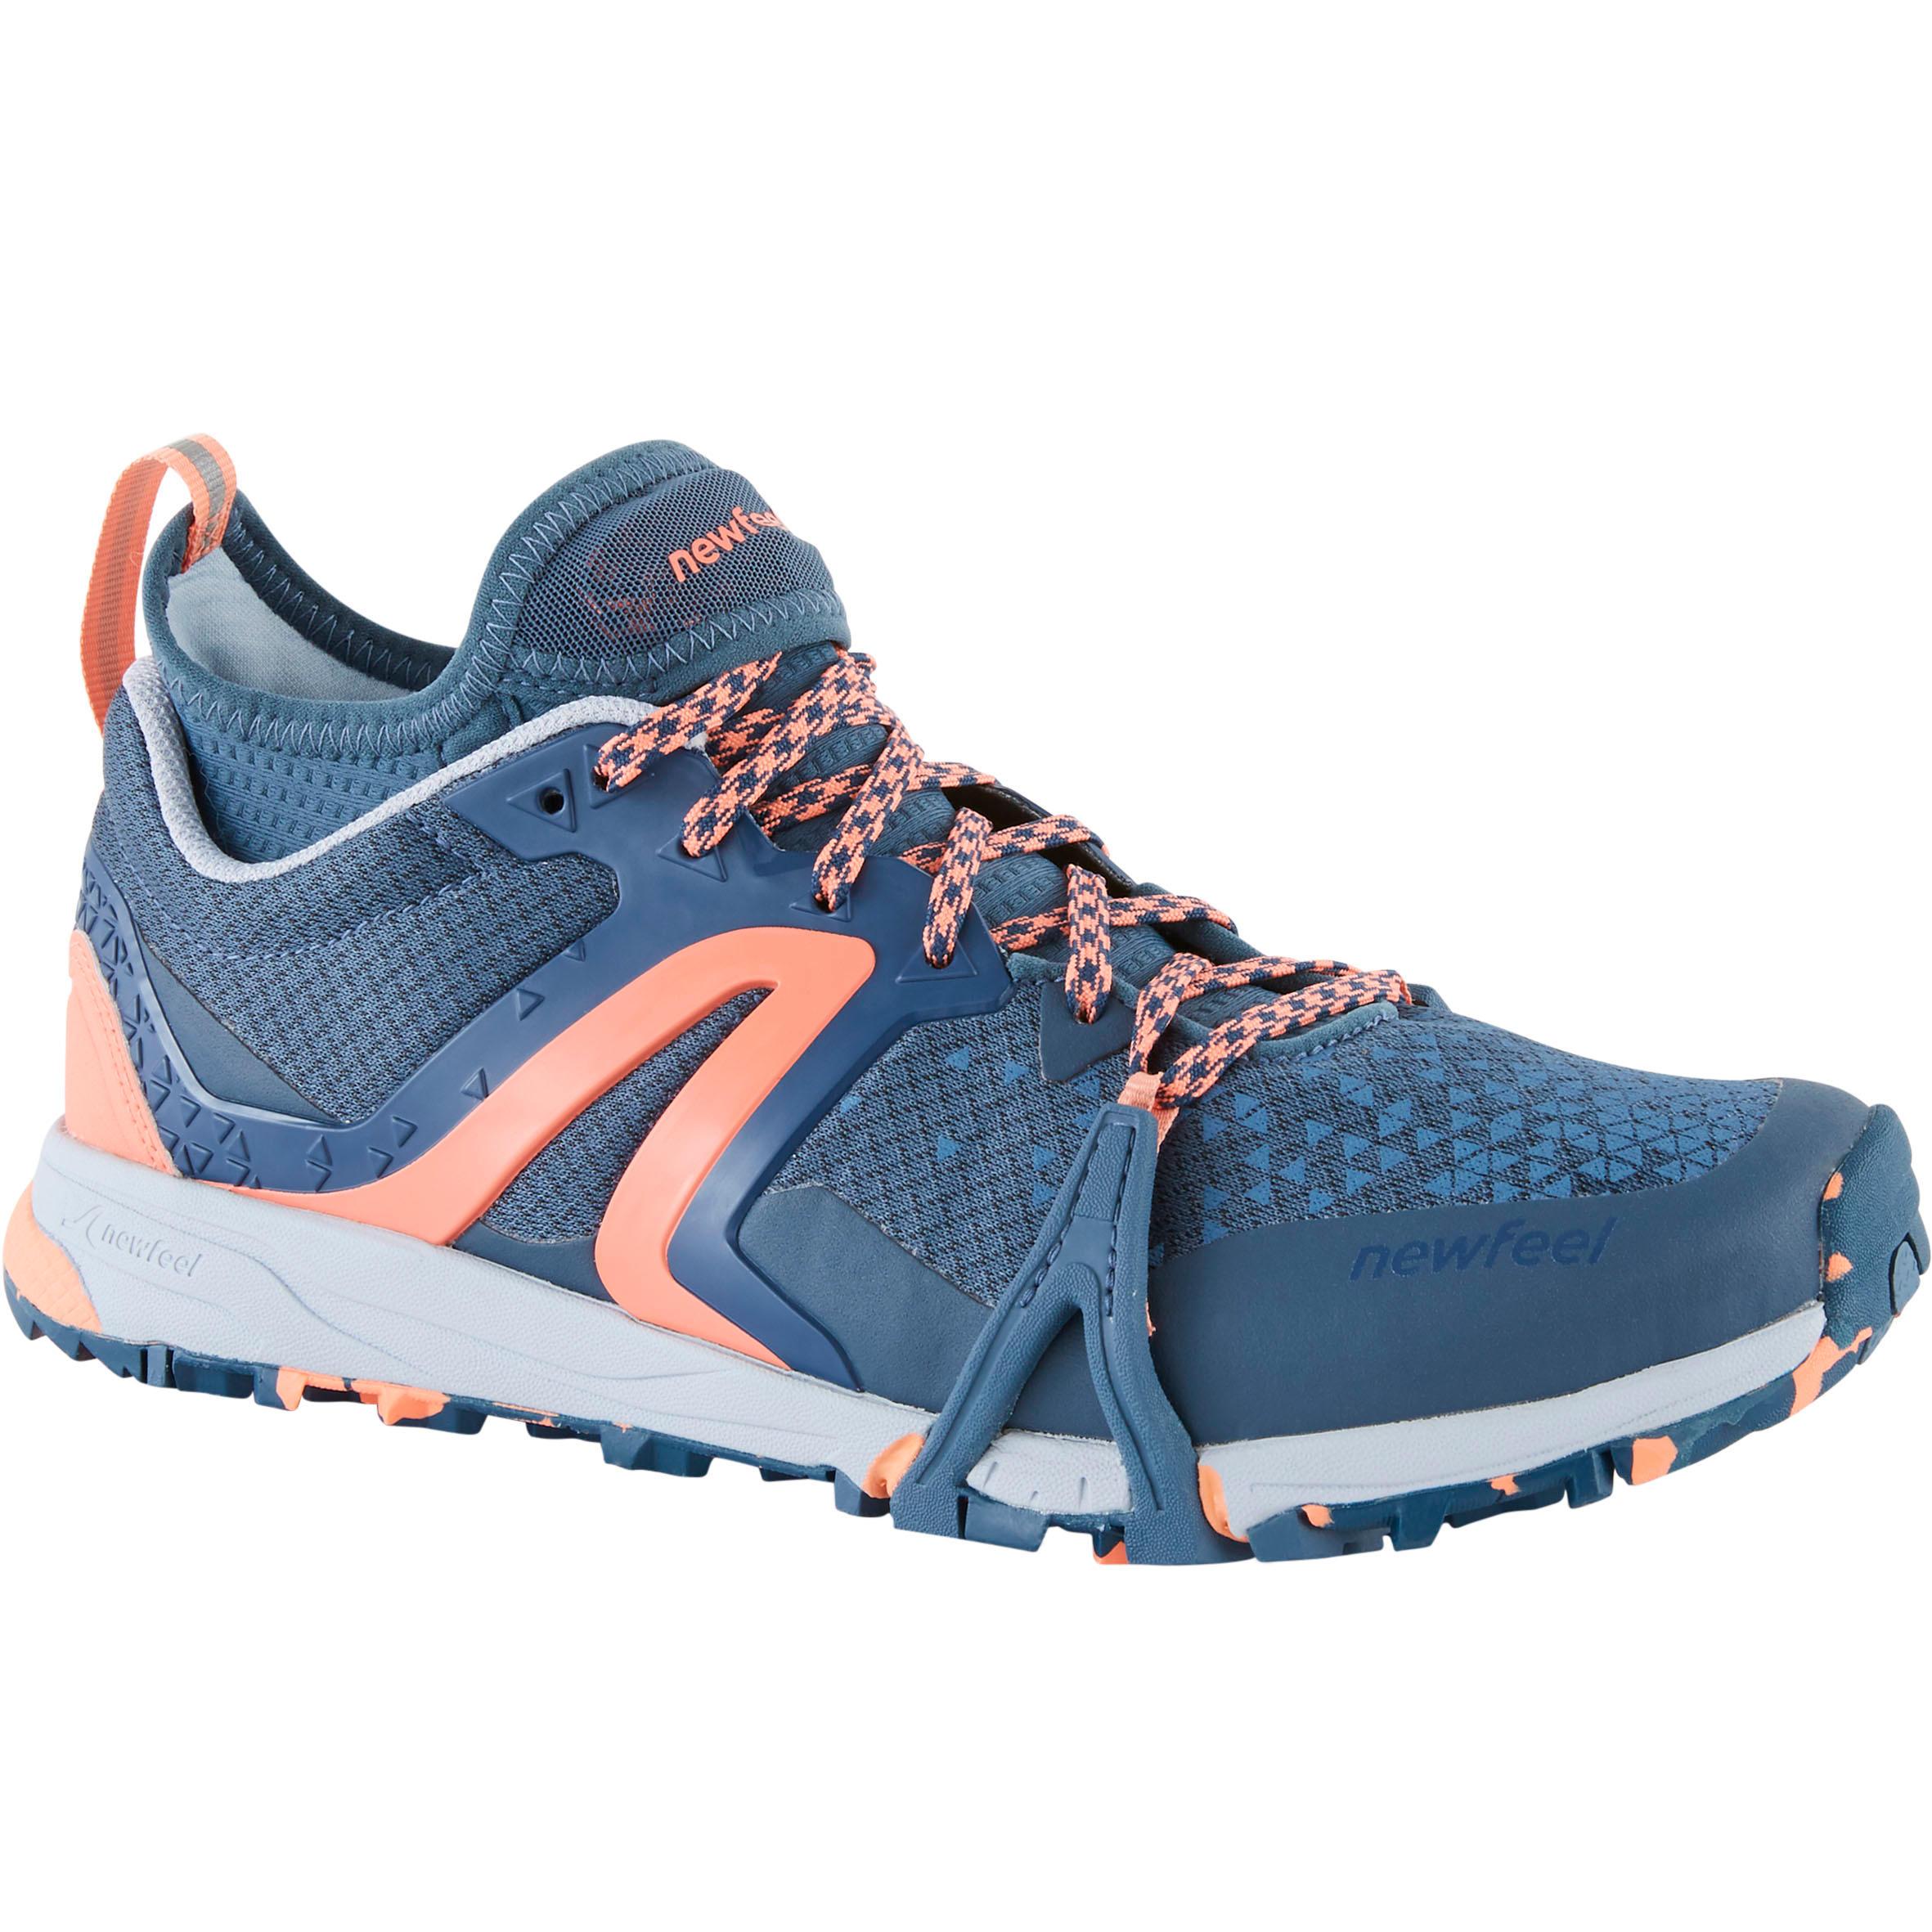 NordicWalkingschuhe NW900 FlexH Damen   Schuhe > Sportschuhe > Walkingschuhe   Newfeel